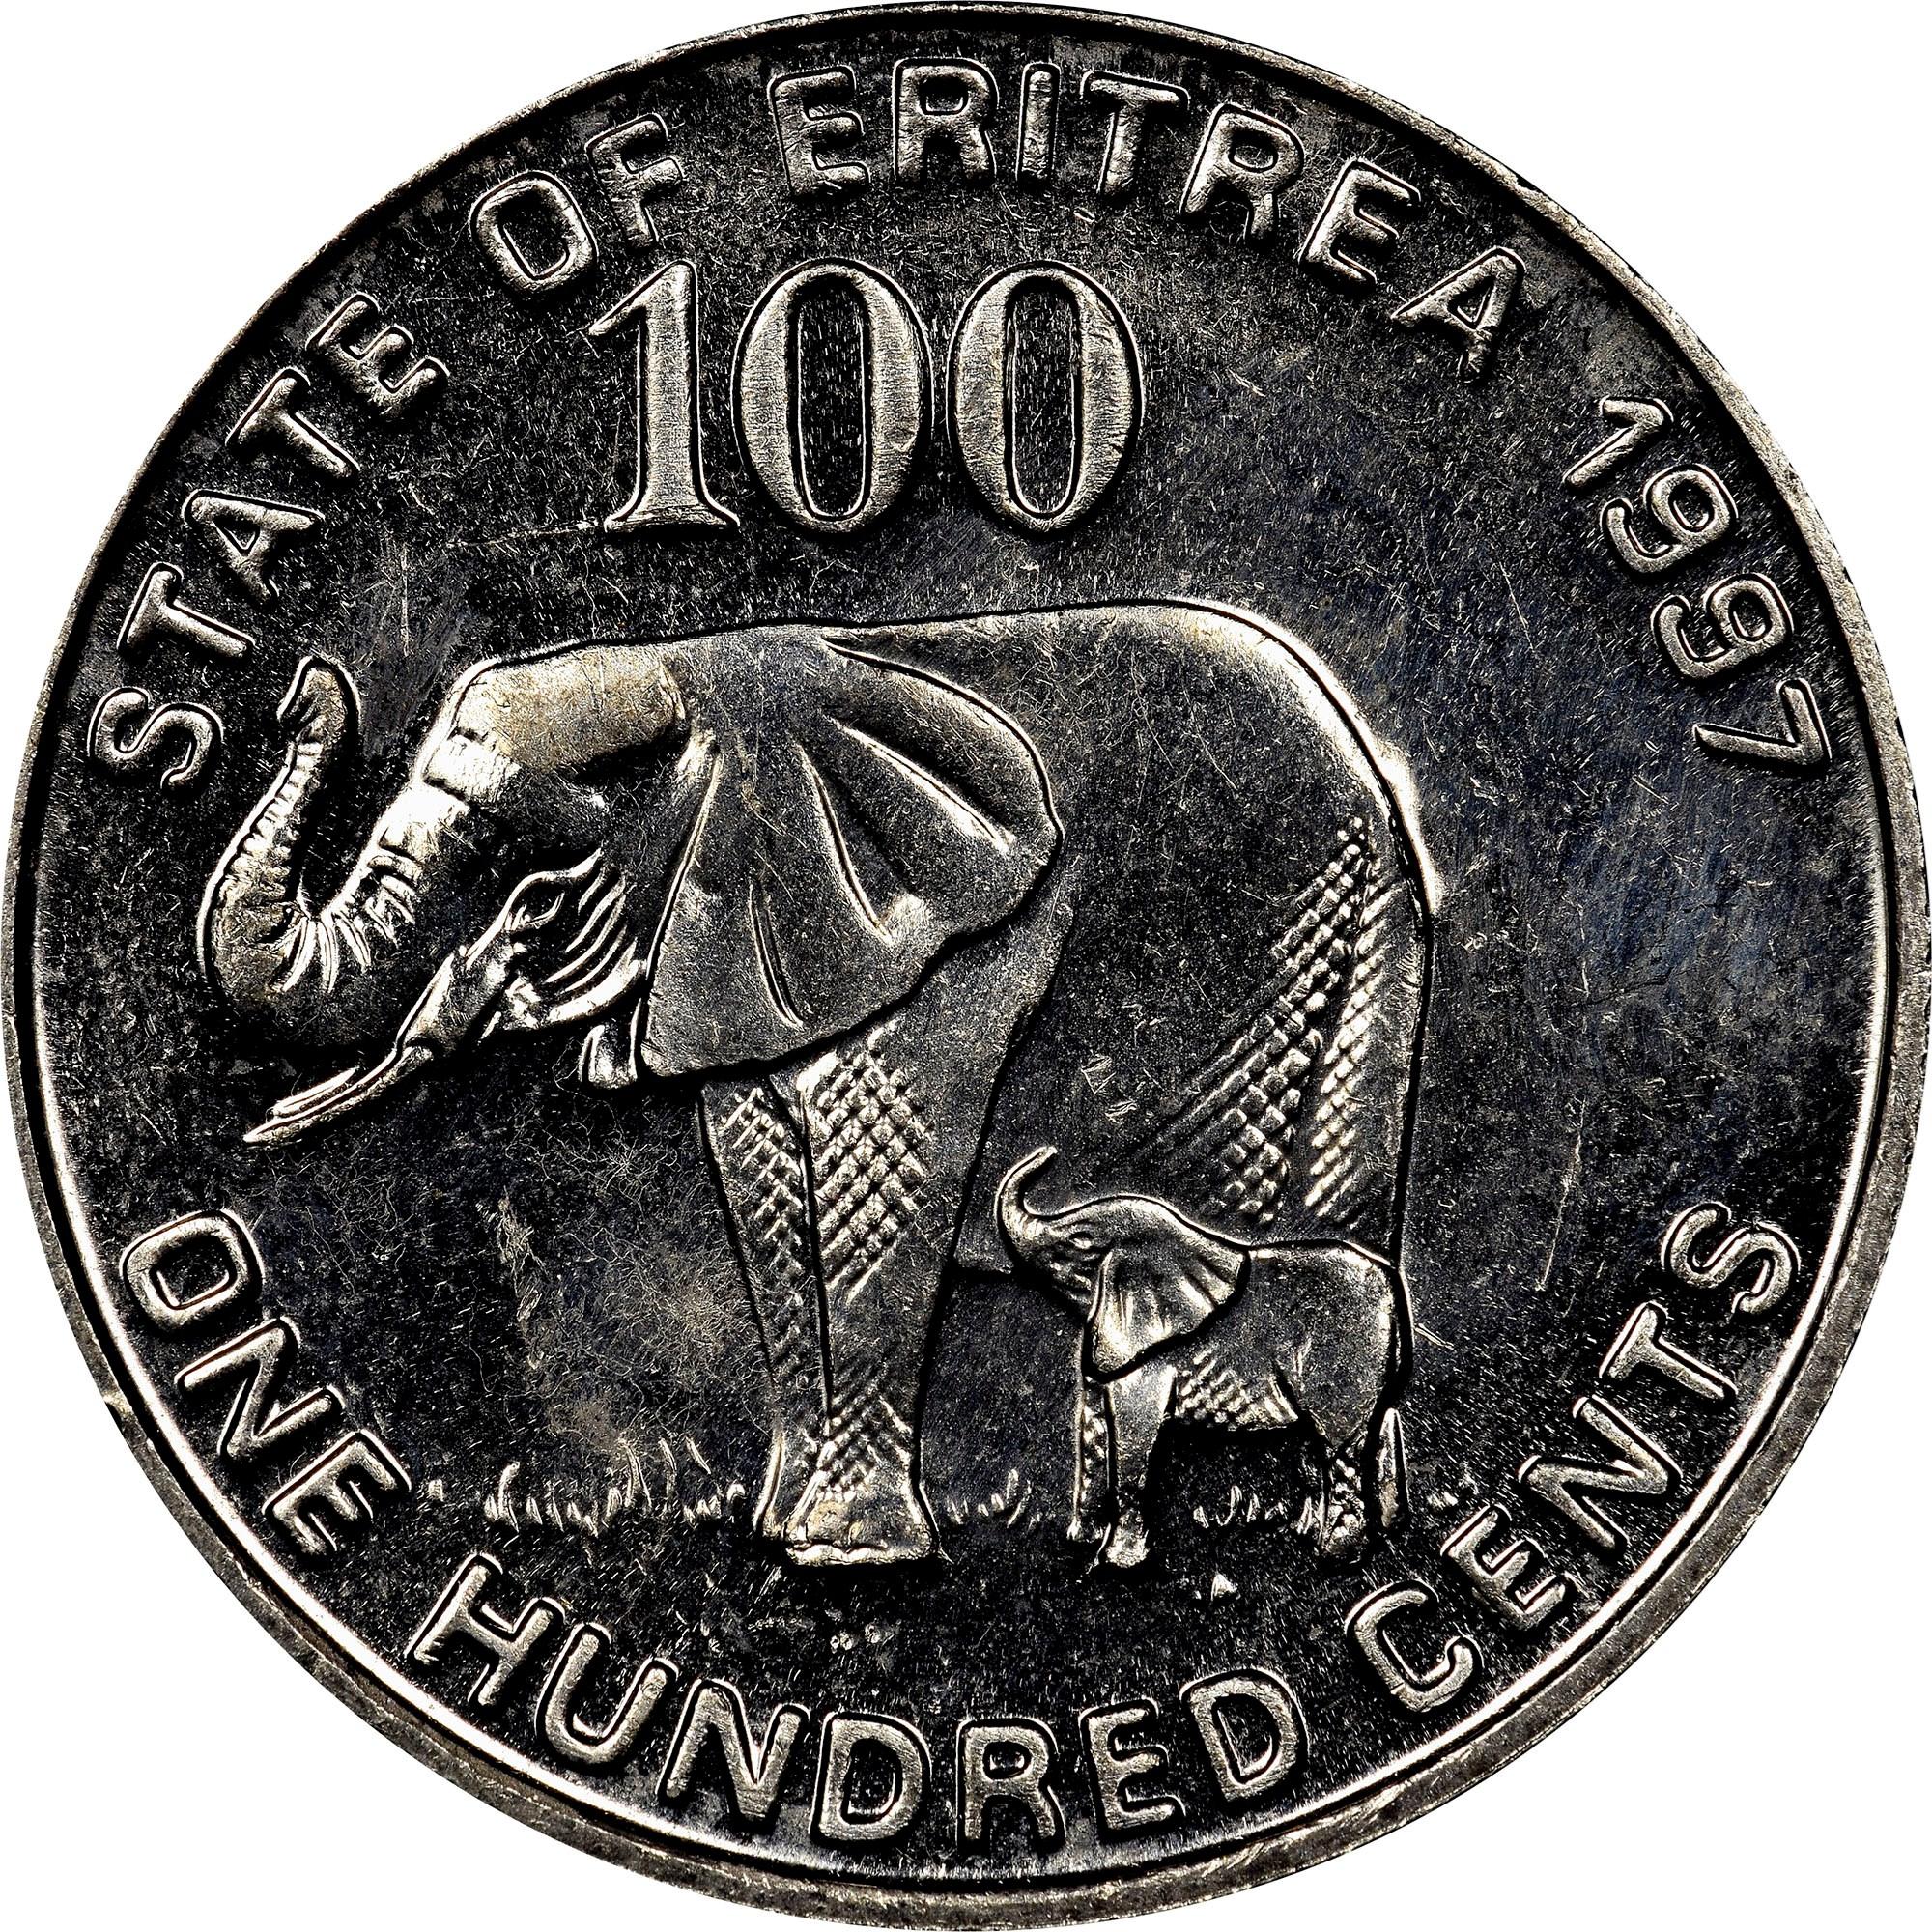 Eritrea 100 Cents obverse